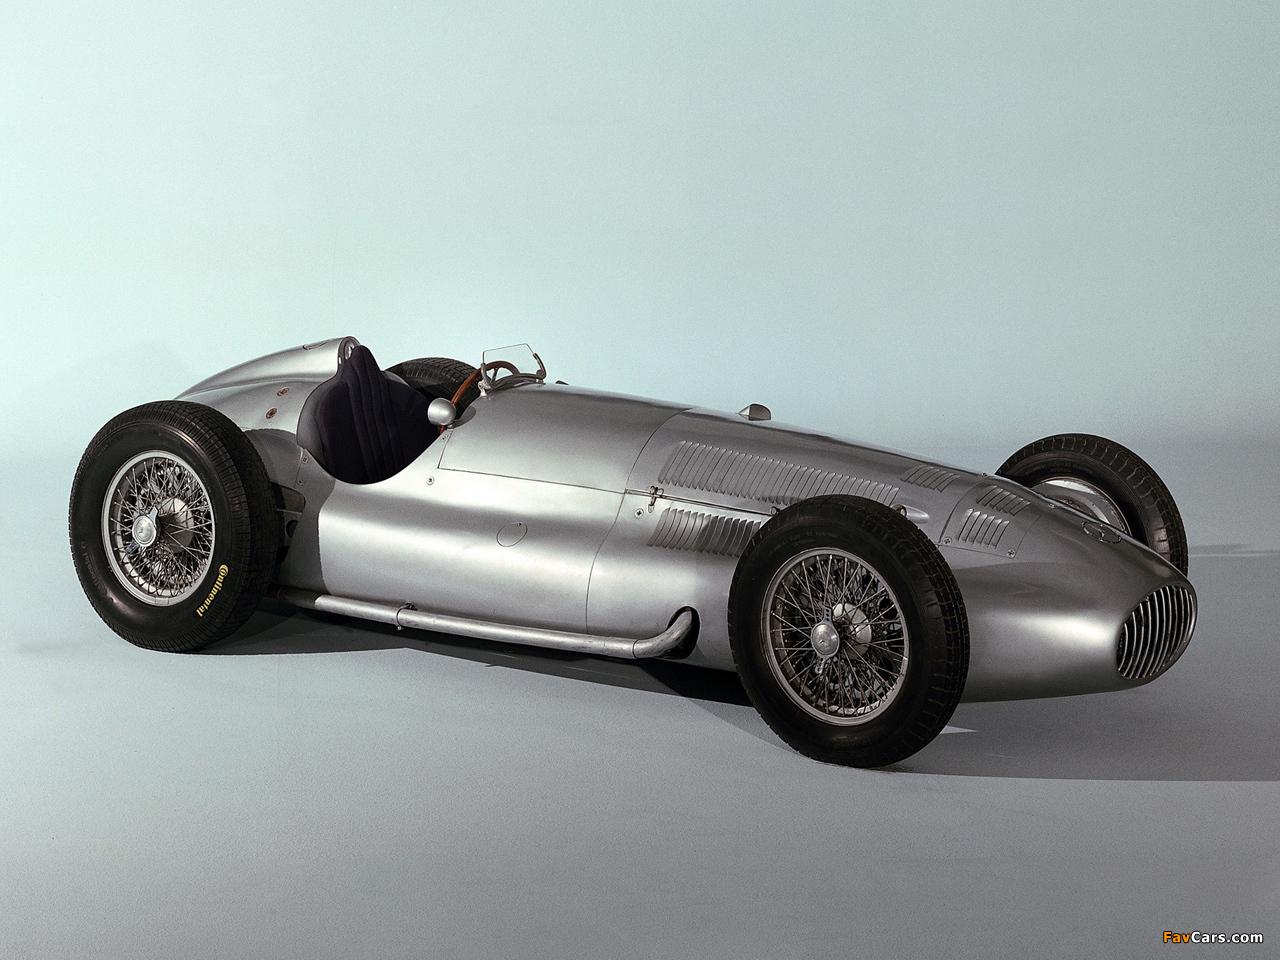 Mercedes benz formula racing car w154 1938 wallpapers for Mercedes benz race cars